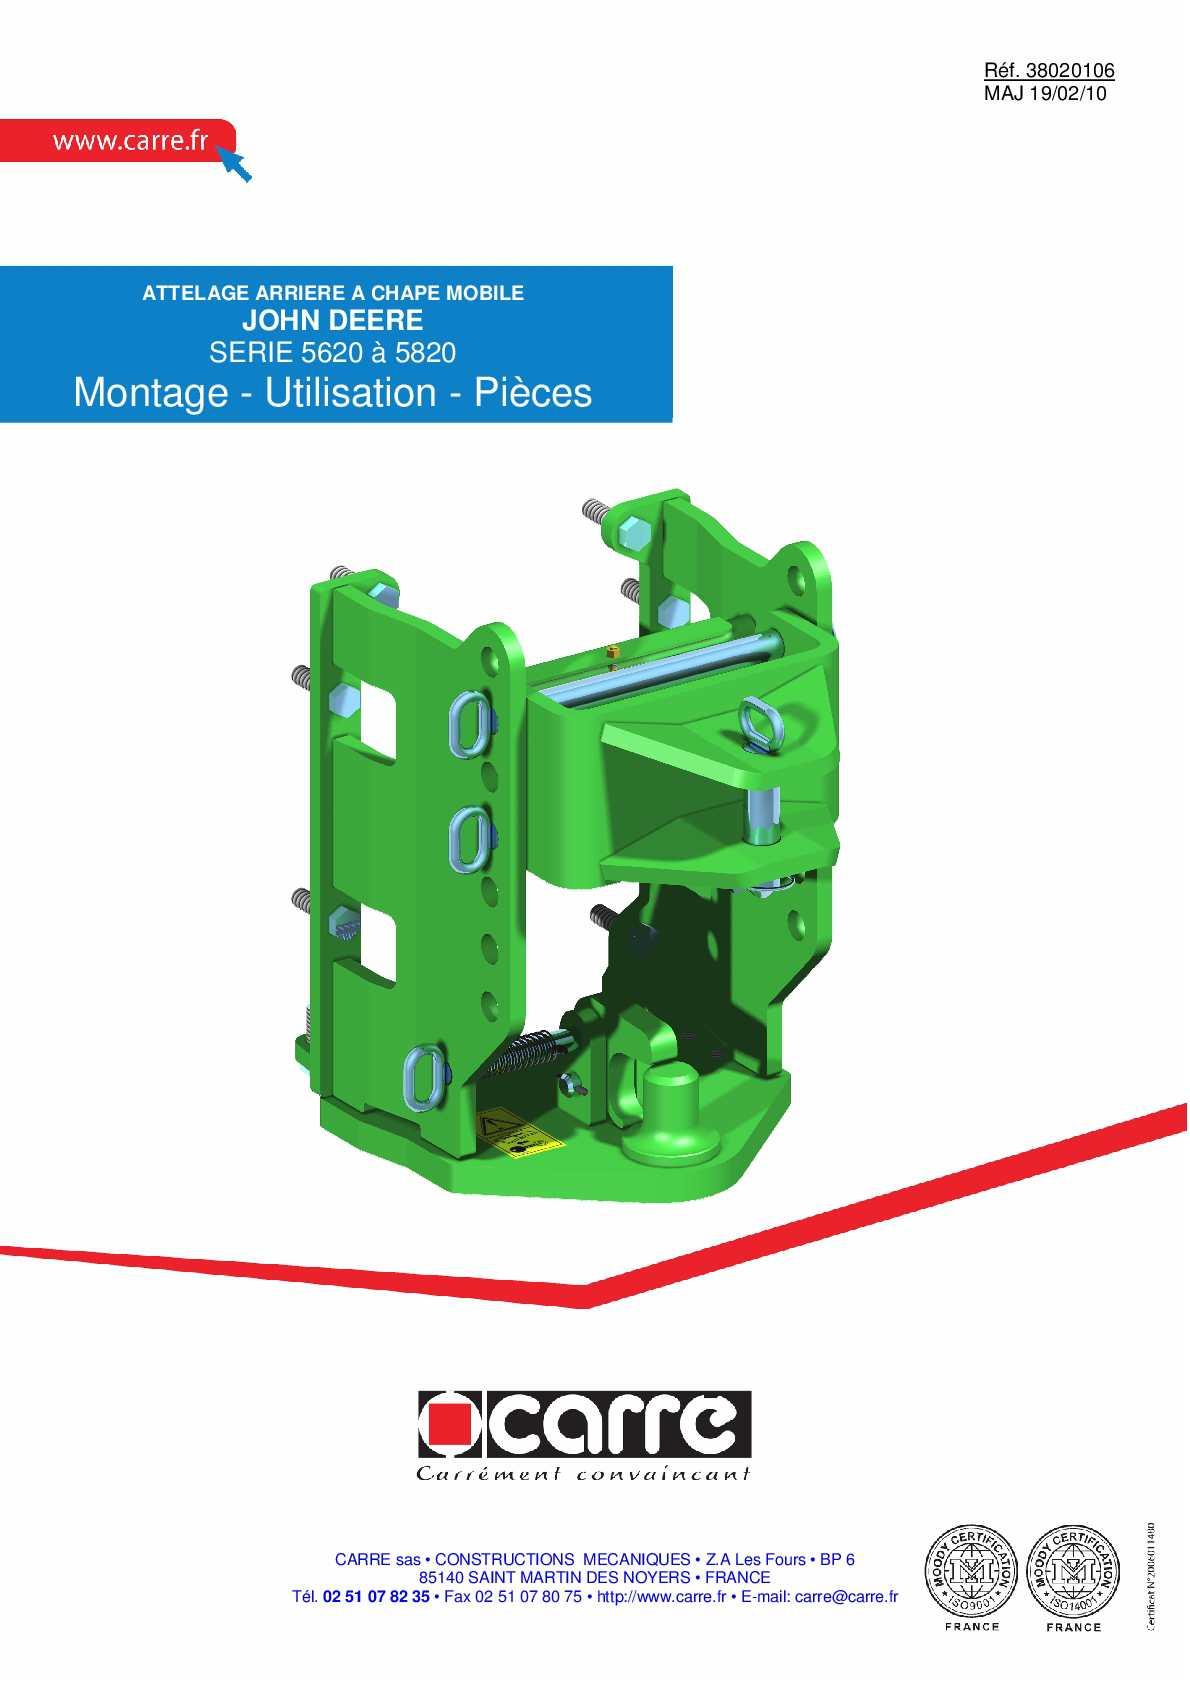 Calam o attelage john deere 5620 5820 - Mesurer hygrometrie d une piece ...